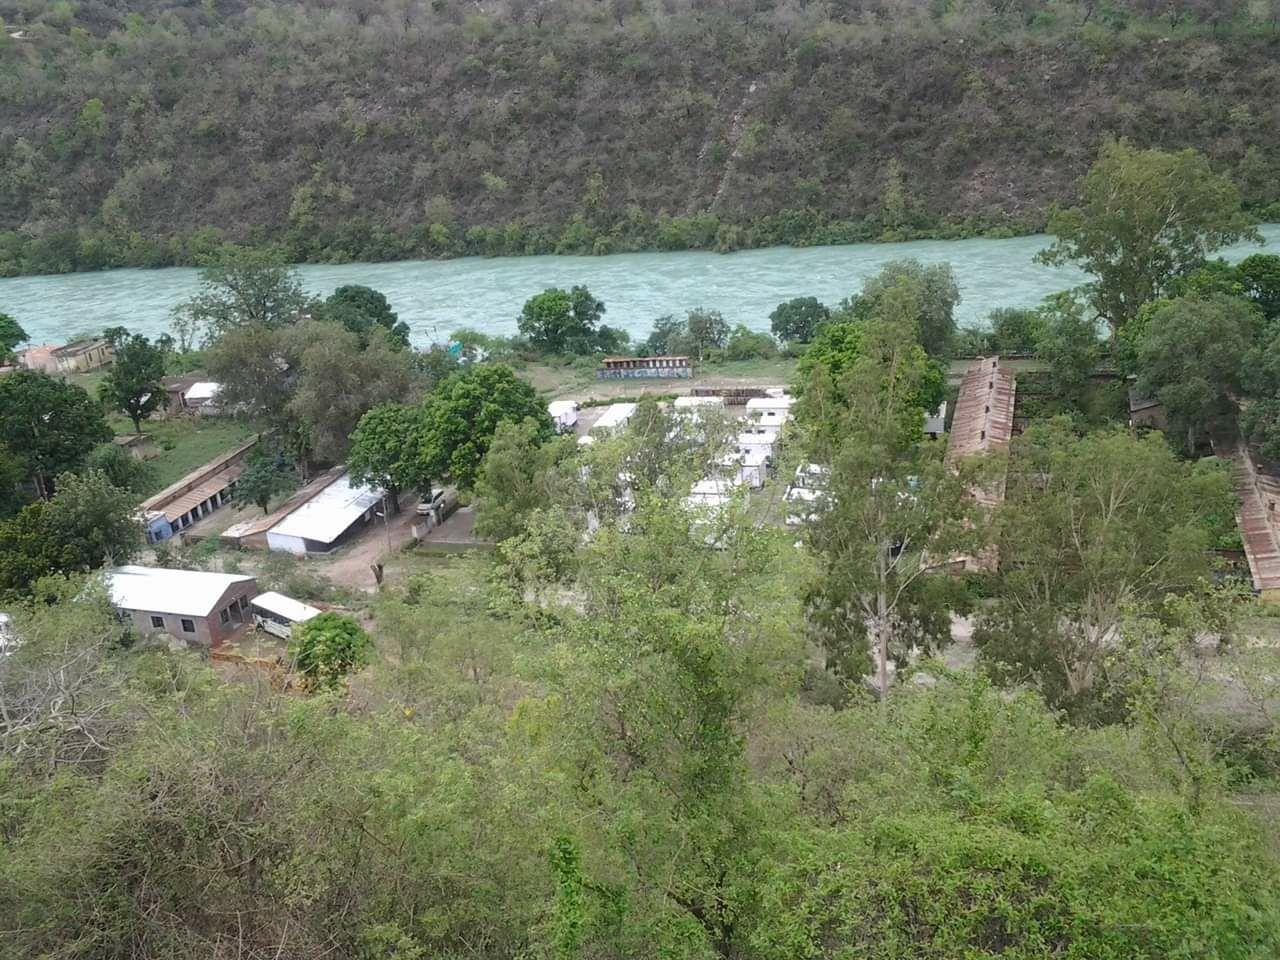 Photo of Bhakhra Dam By Jeevan Surjuse